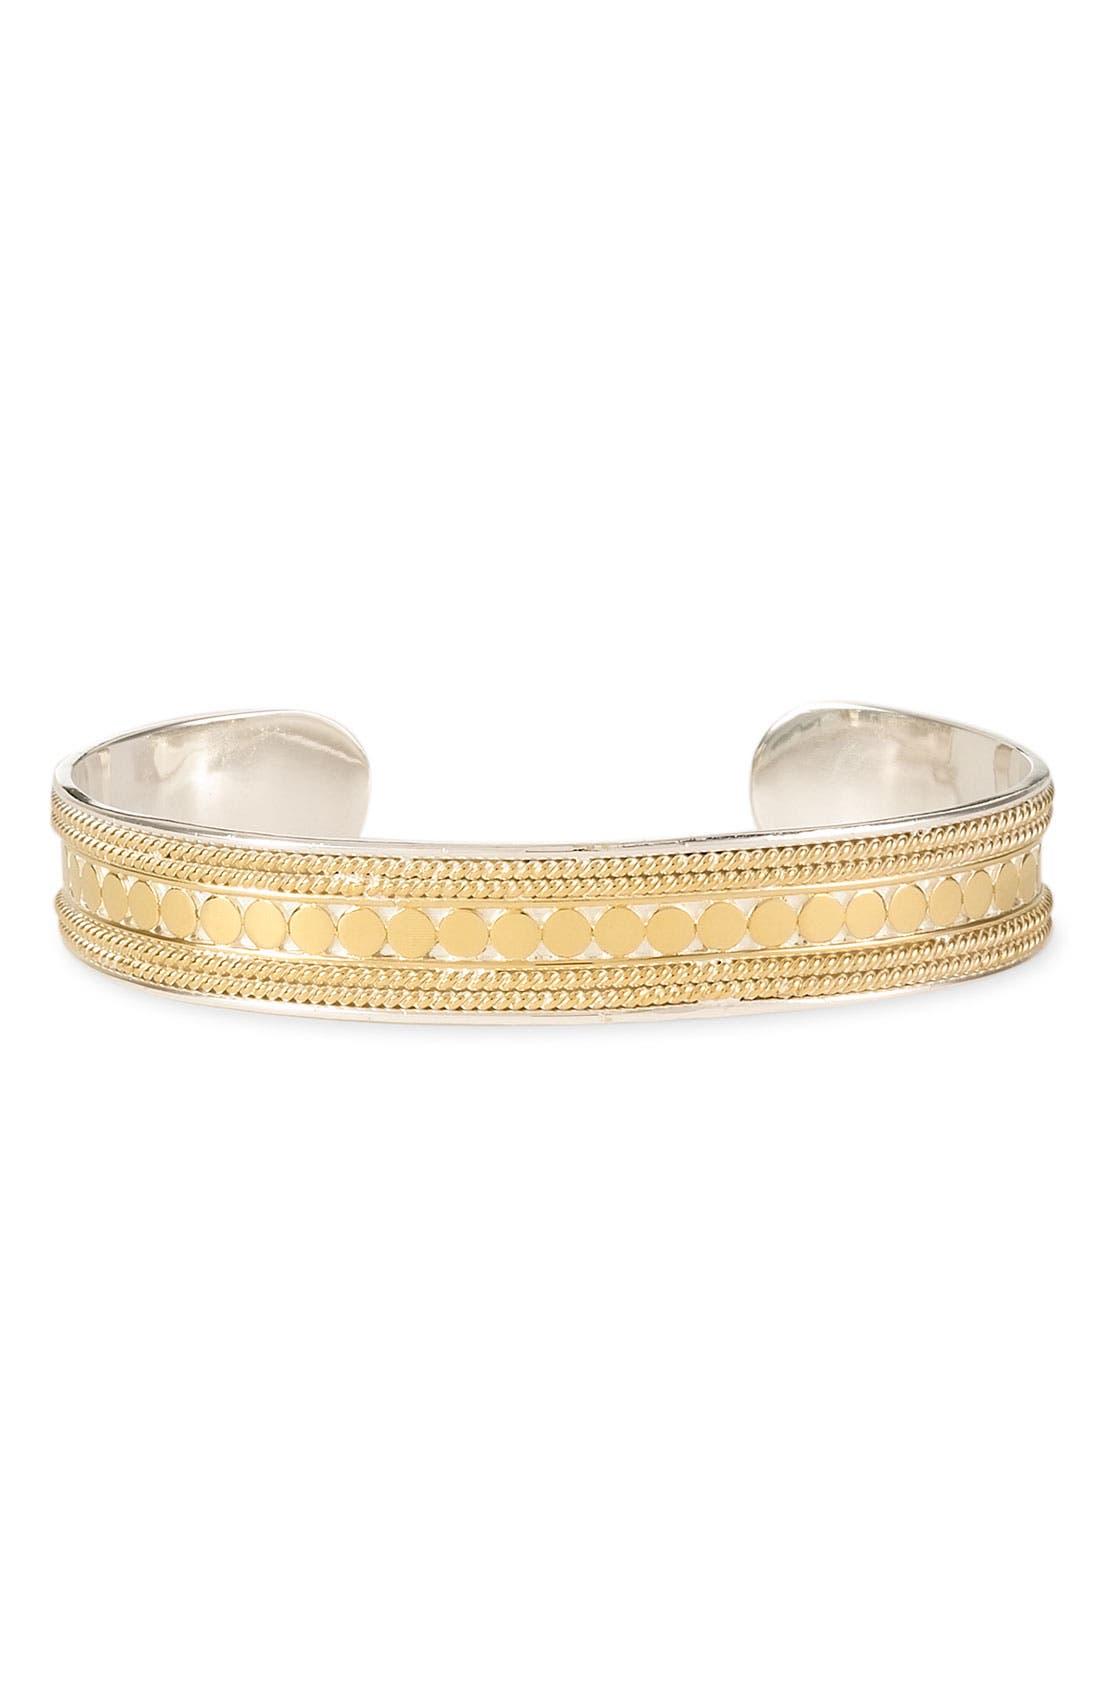 Alternate Image 1 Selected - Anna Beck 'Gili' Skinny Cuff Bracelet